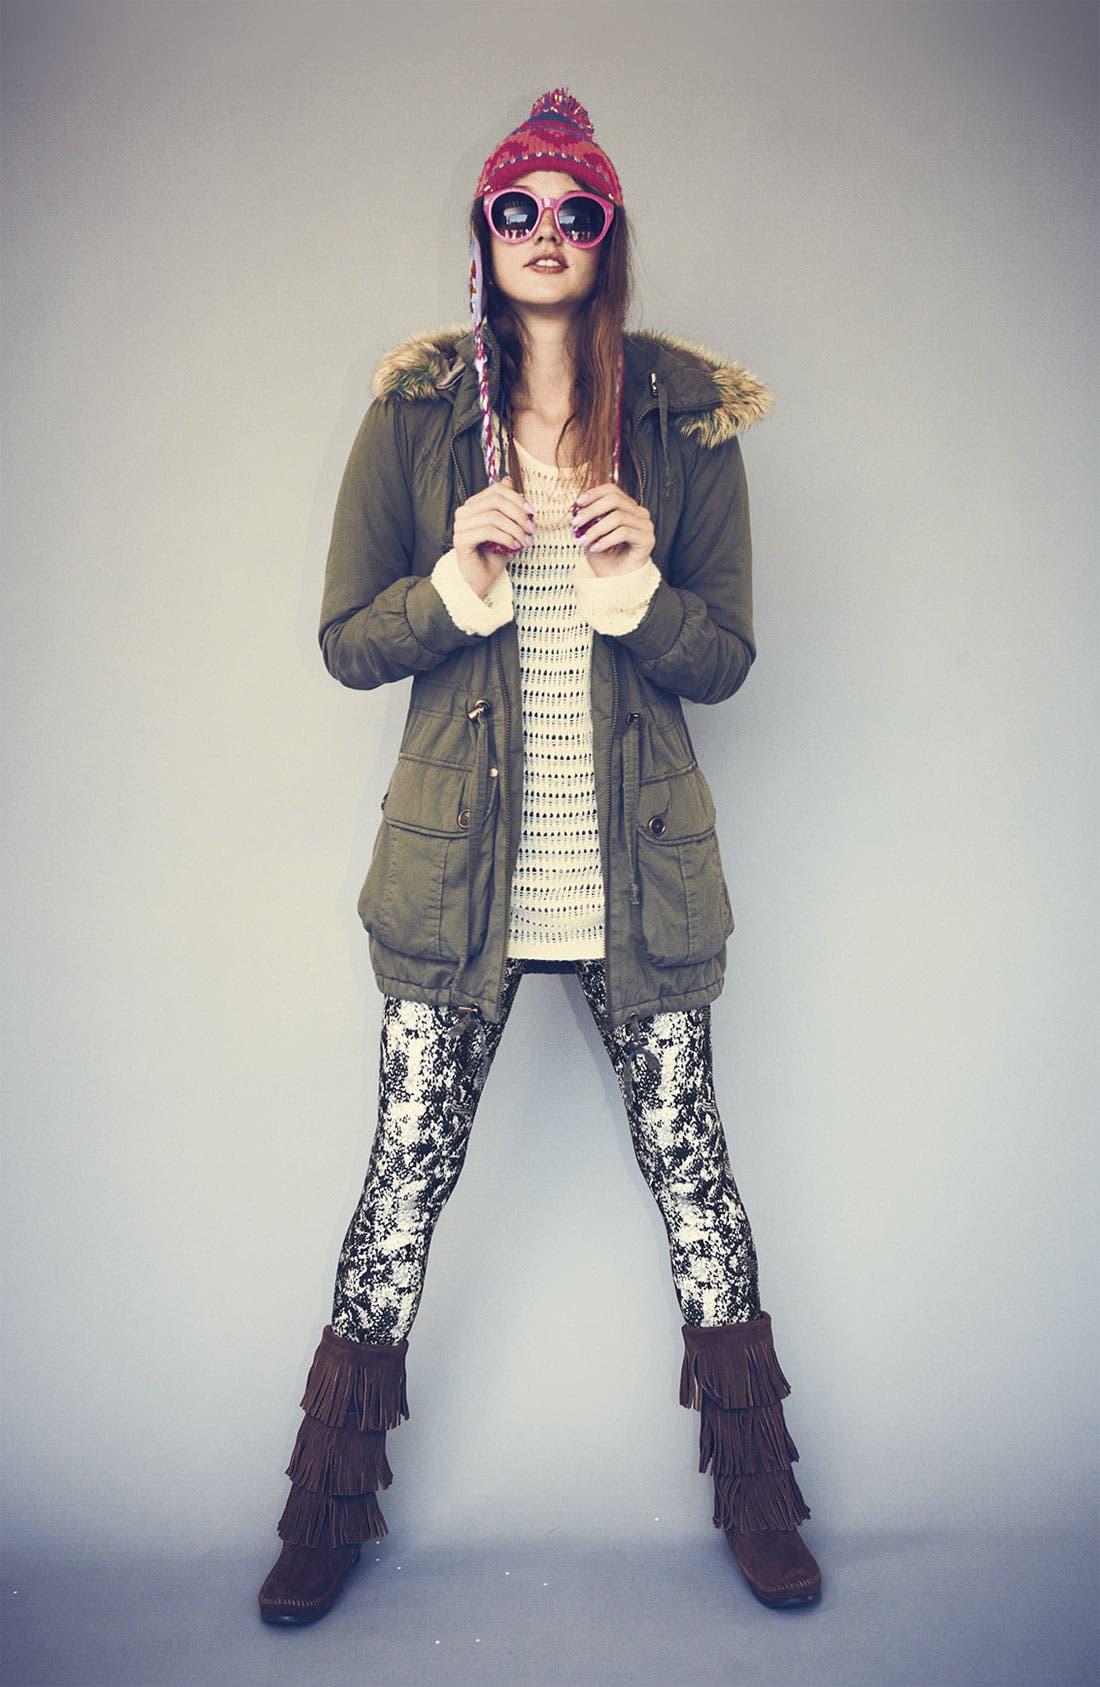 Alternate Image 1 Selected - Sashimi Anorak, Frenchi® Sweater & Mimi Chica Leggings